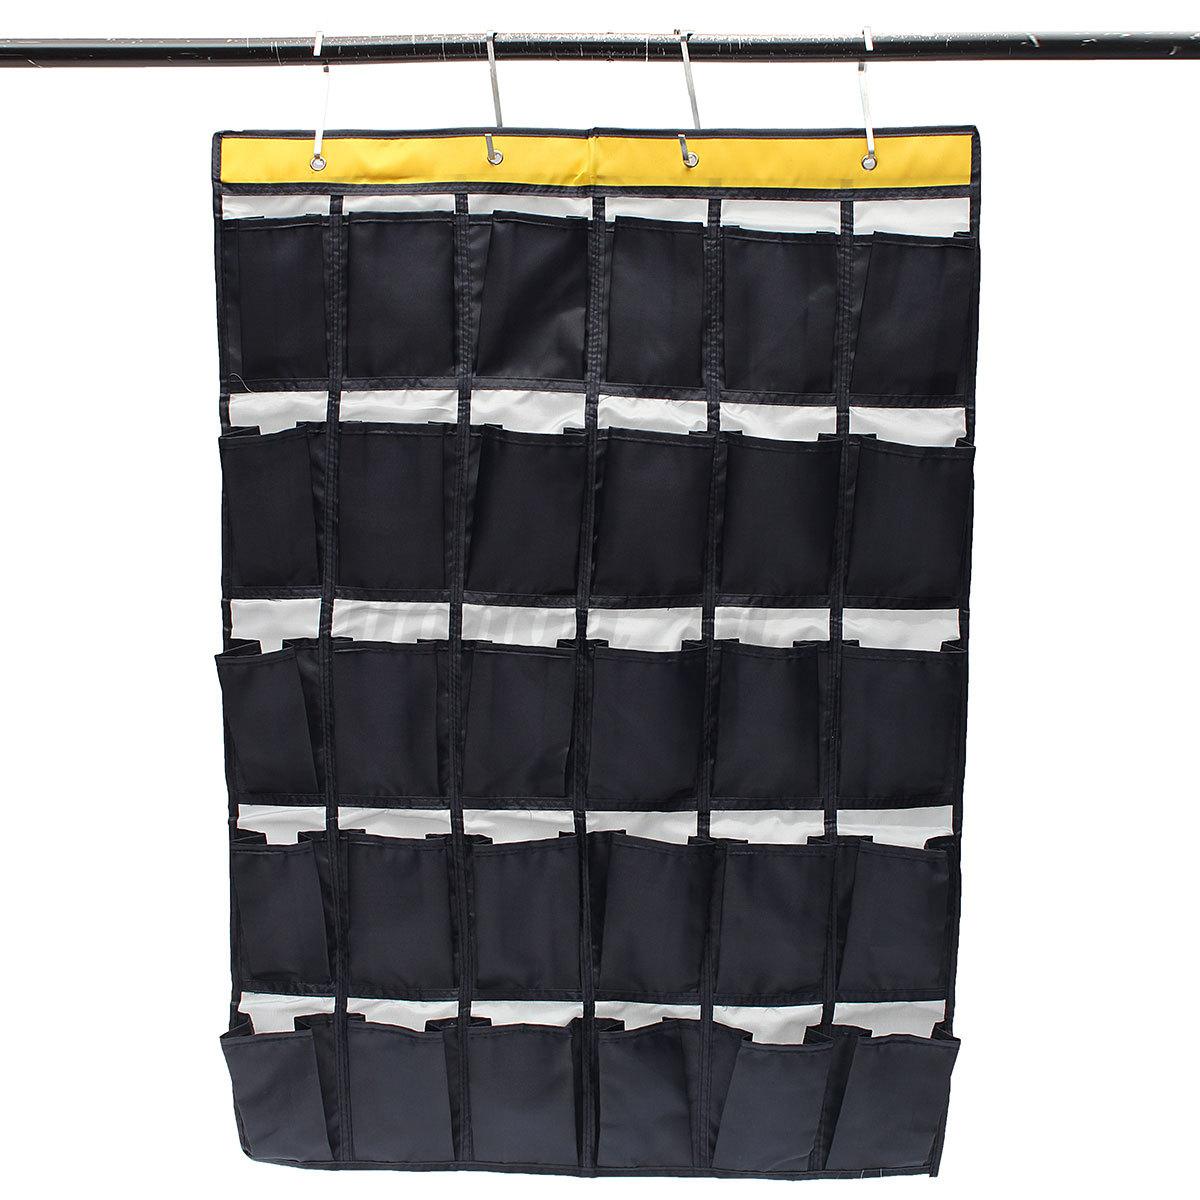 30 poche de rangement suspendre sac mural organisateur chaussures range pliable ebay. Black Bedroom Furniture Sets. Home Design Ideas